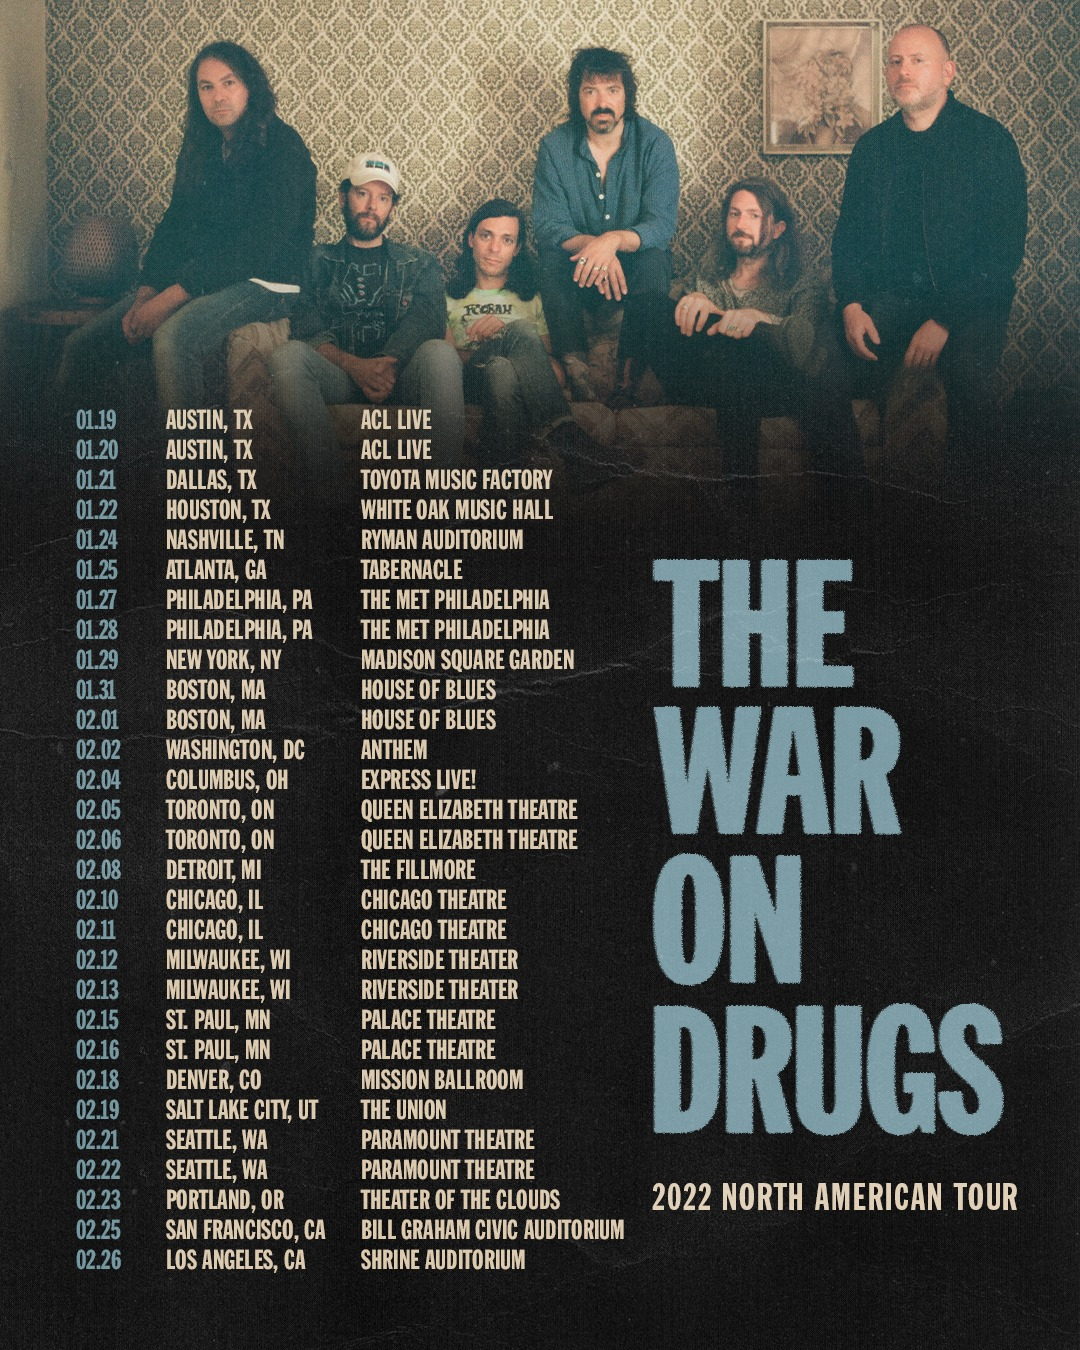 The War Drugs 2022 Tour